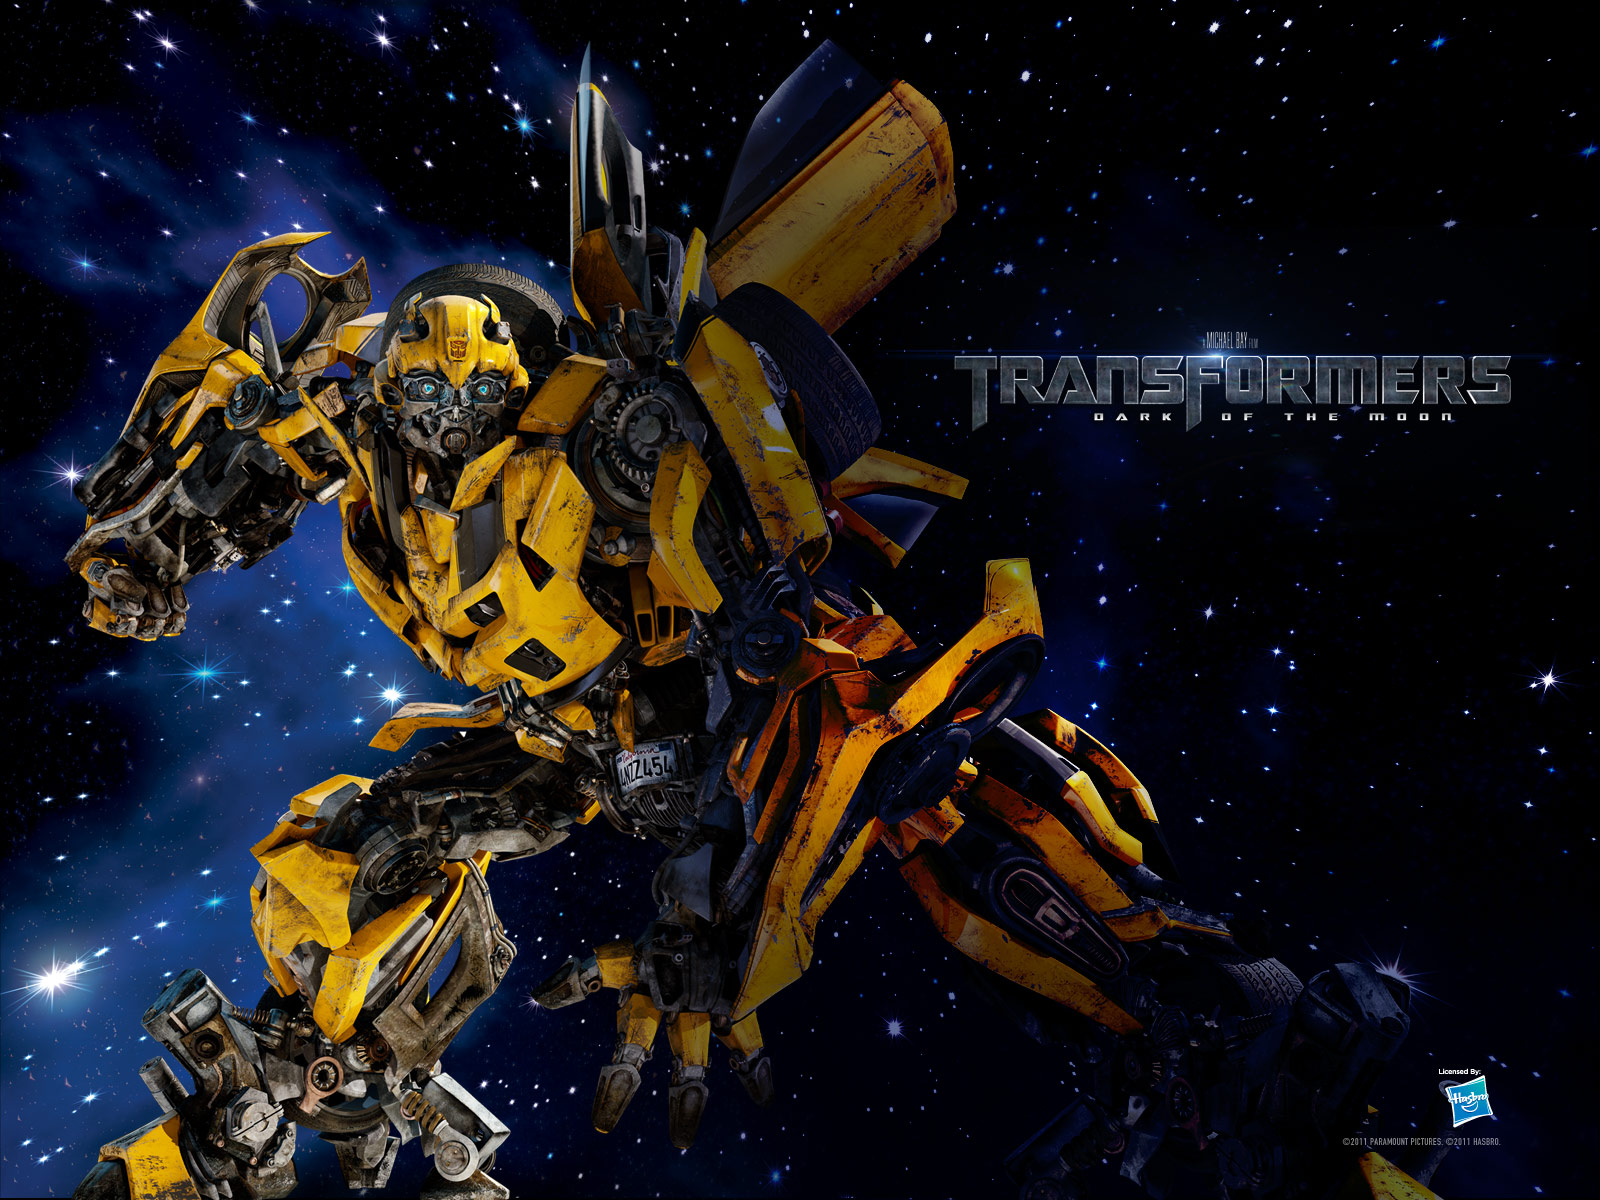 TRANSFORMERS MATRIX WALLPAPERS Bumblebee movie HD 1600x1200